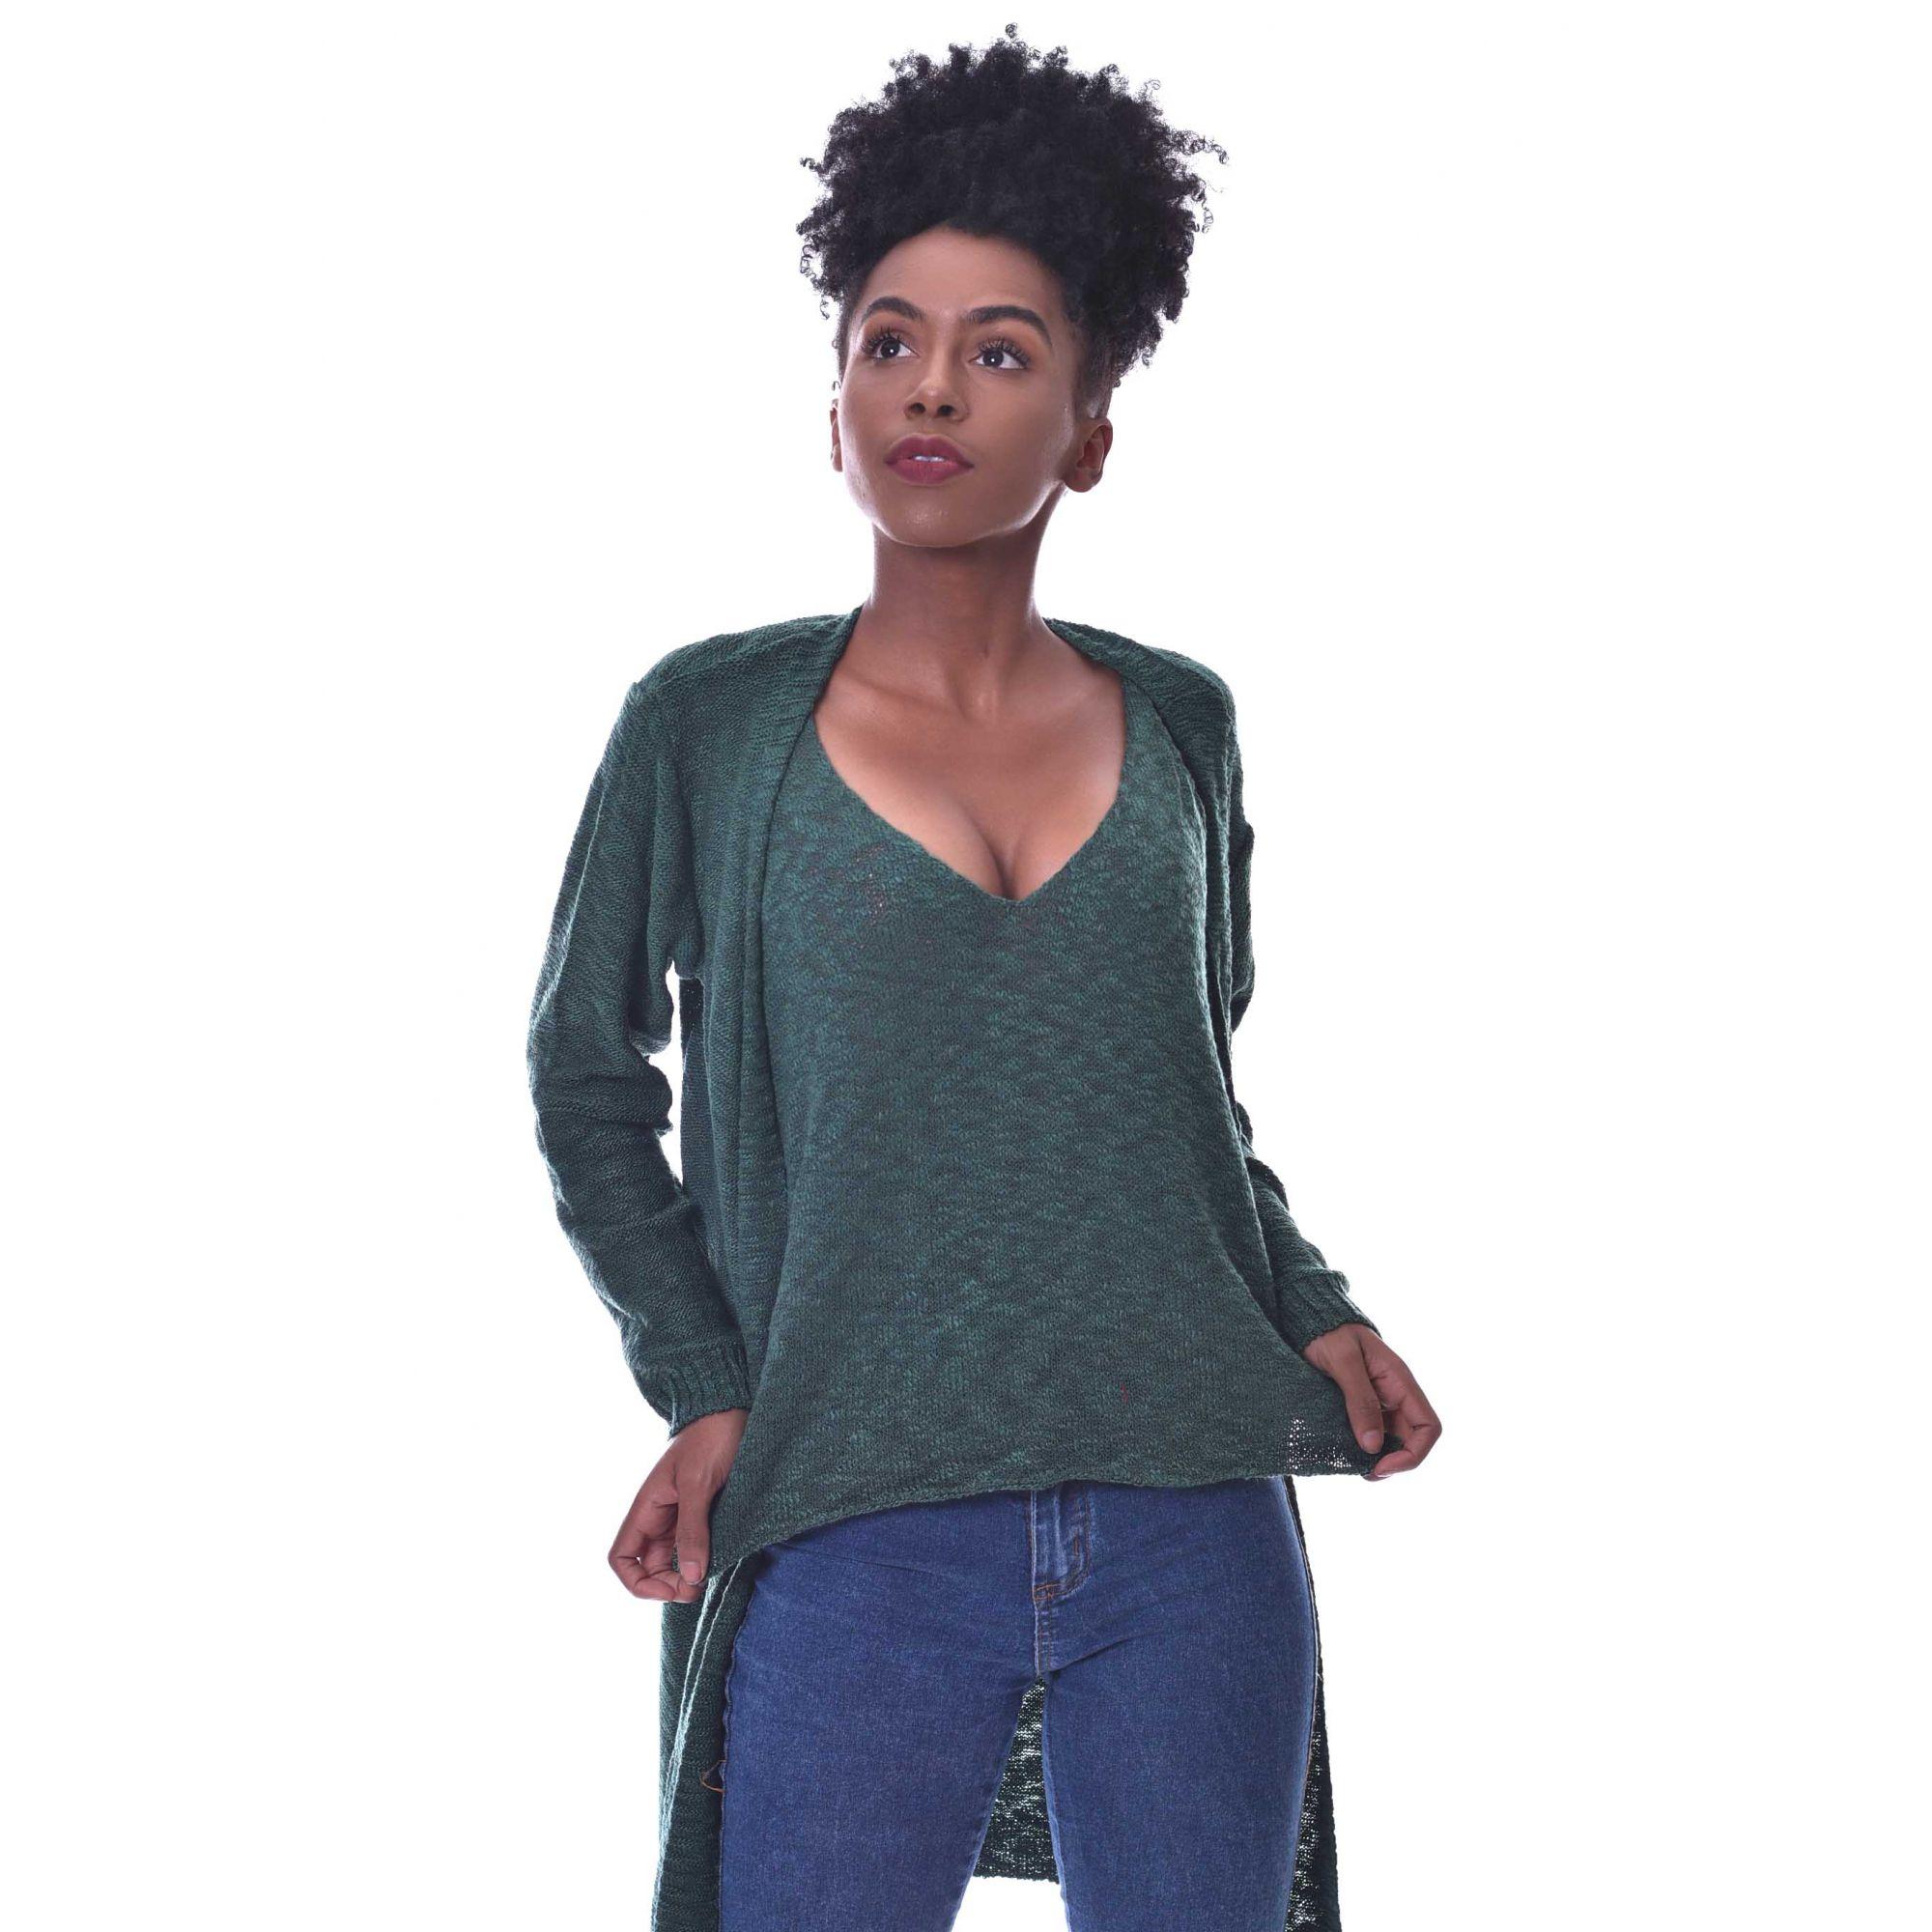 Blusa Regata Vera Tricot Feminino Verde